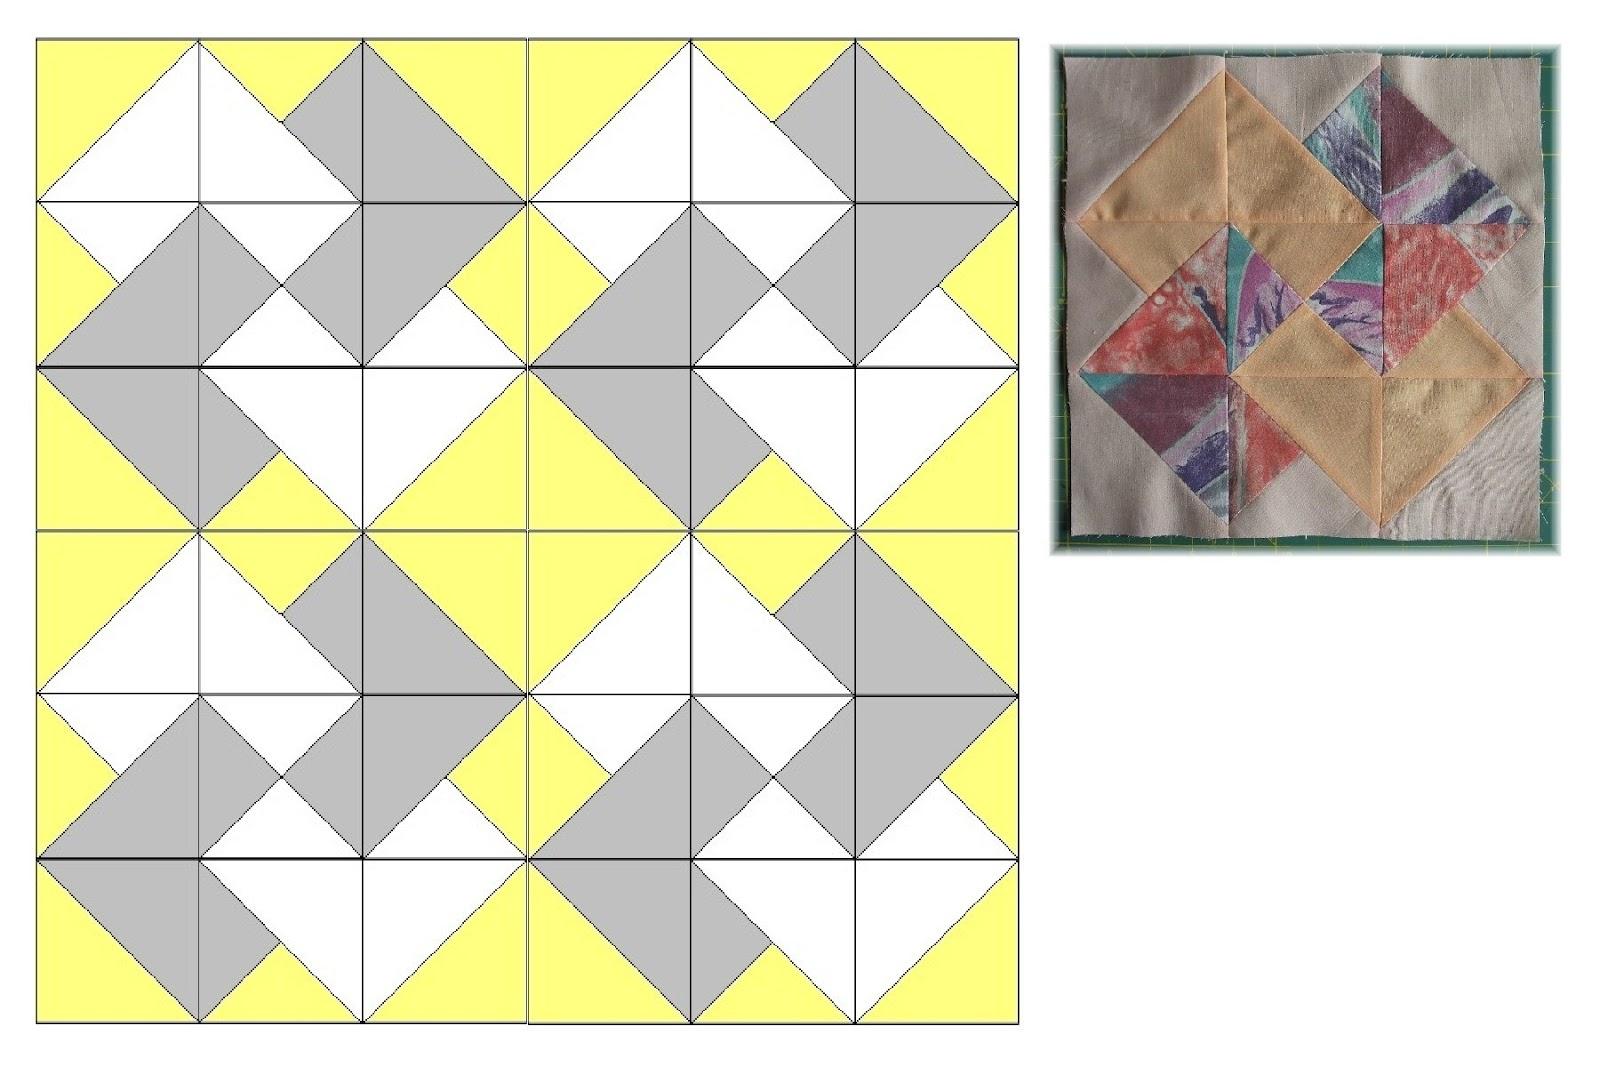 Mein Hobby - Nadelzauber: 9ner Block Muster X